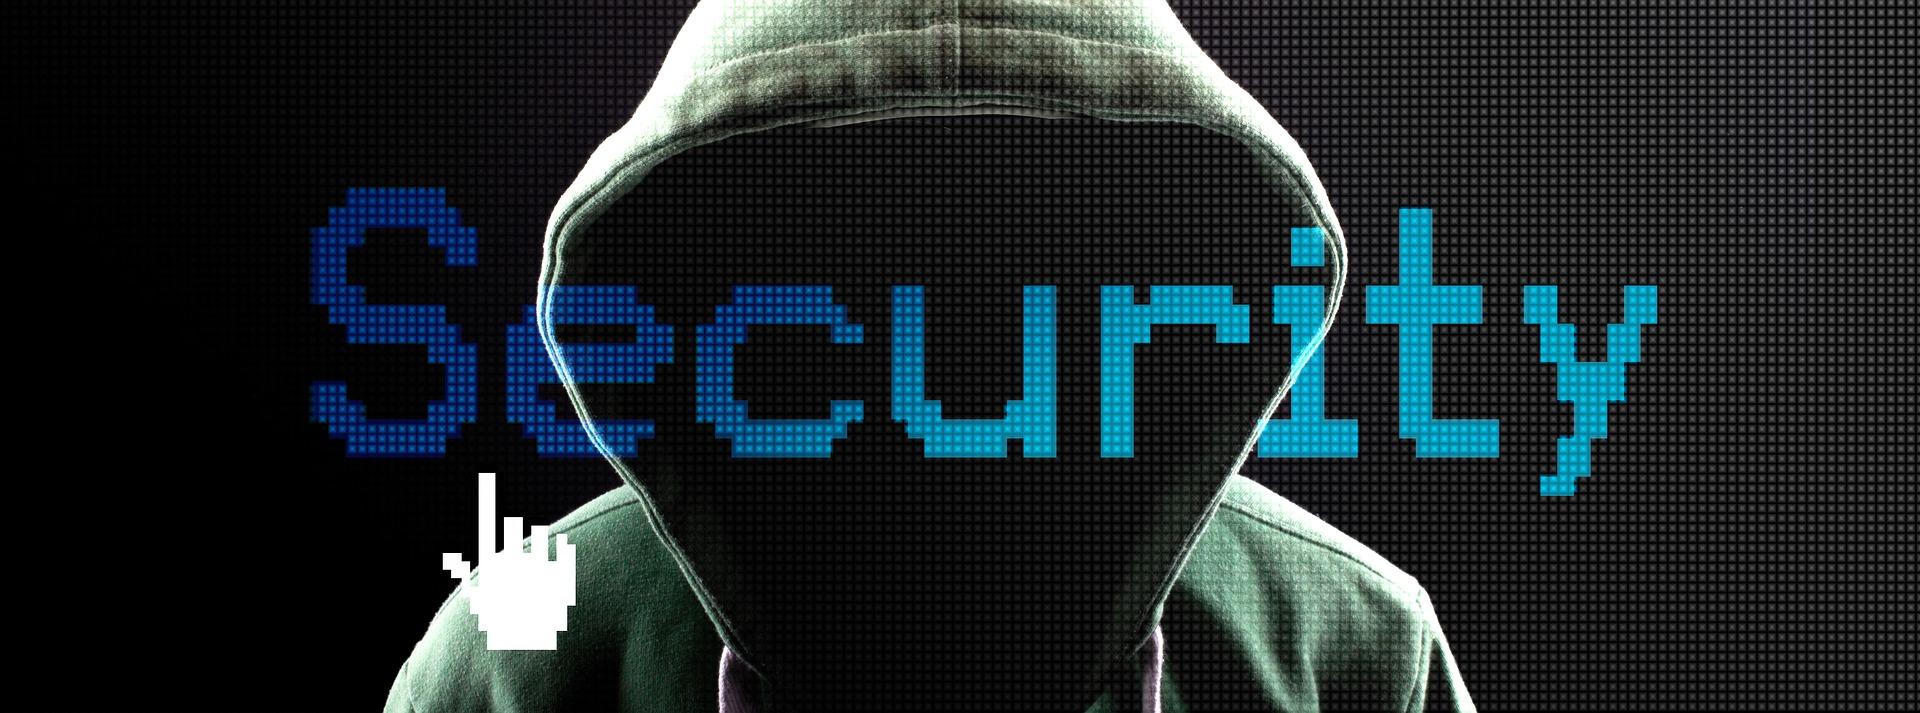 security-4017261_1920